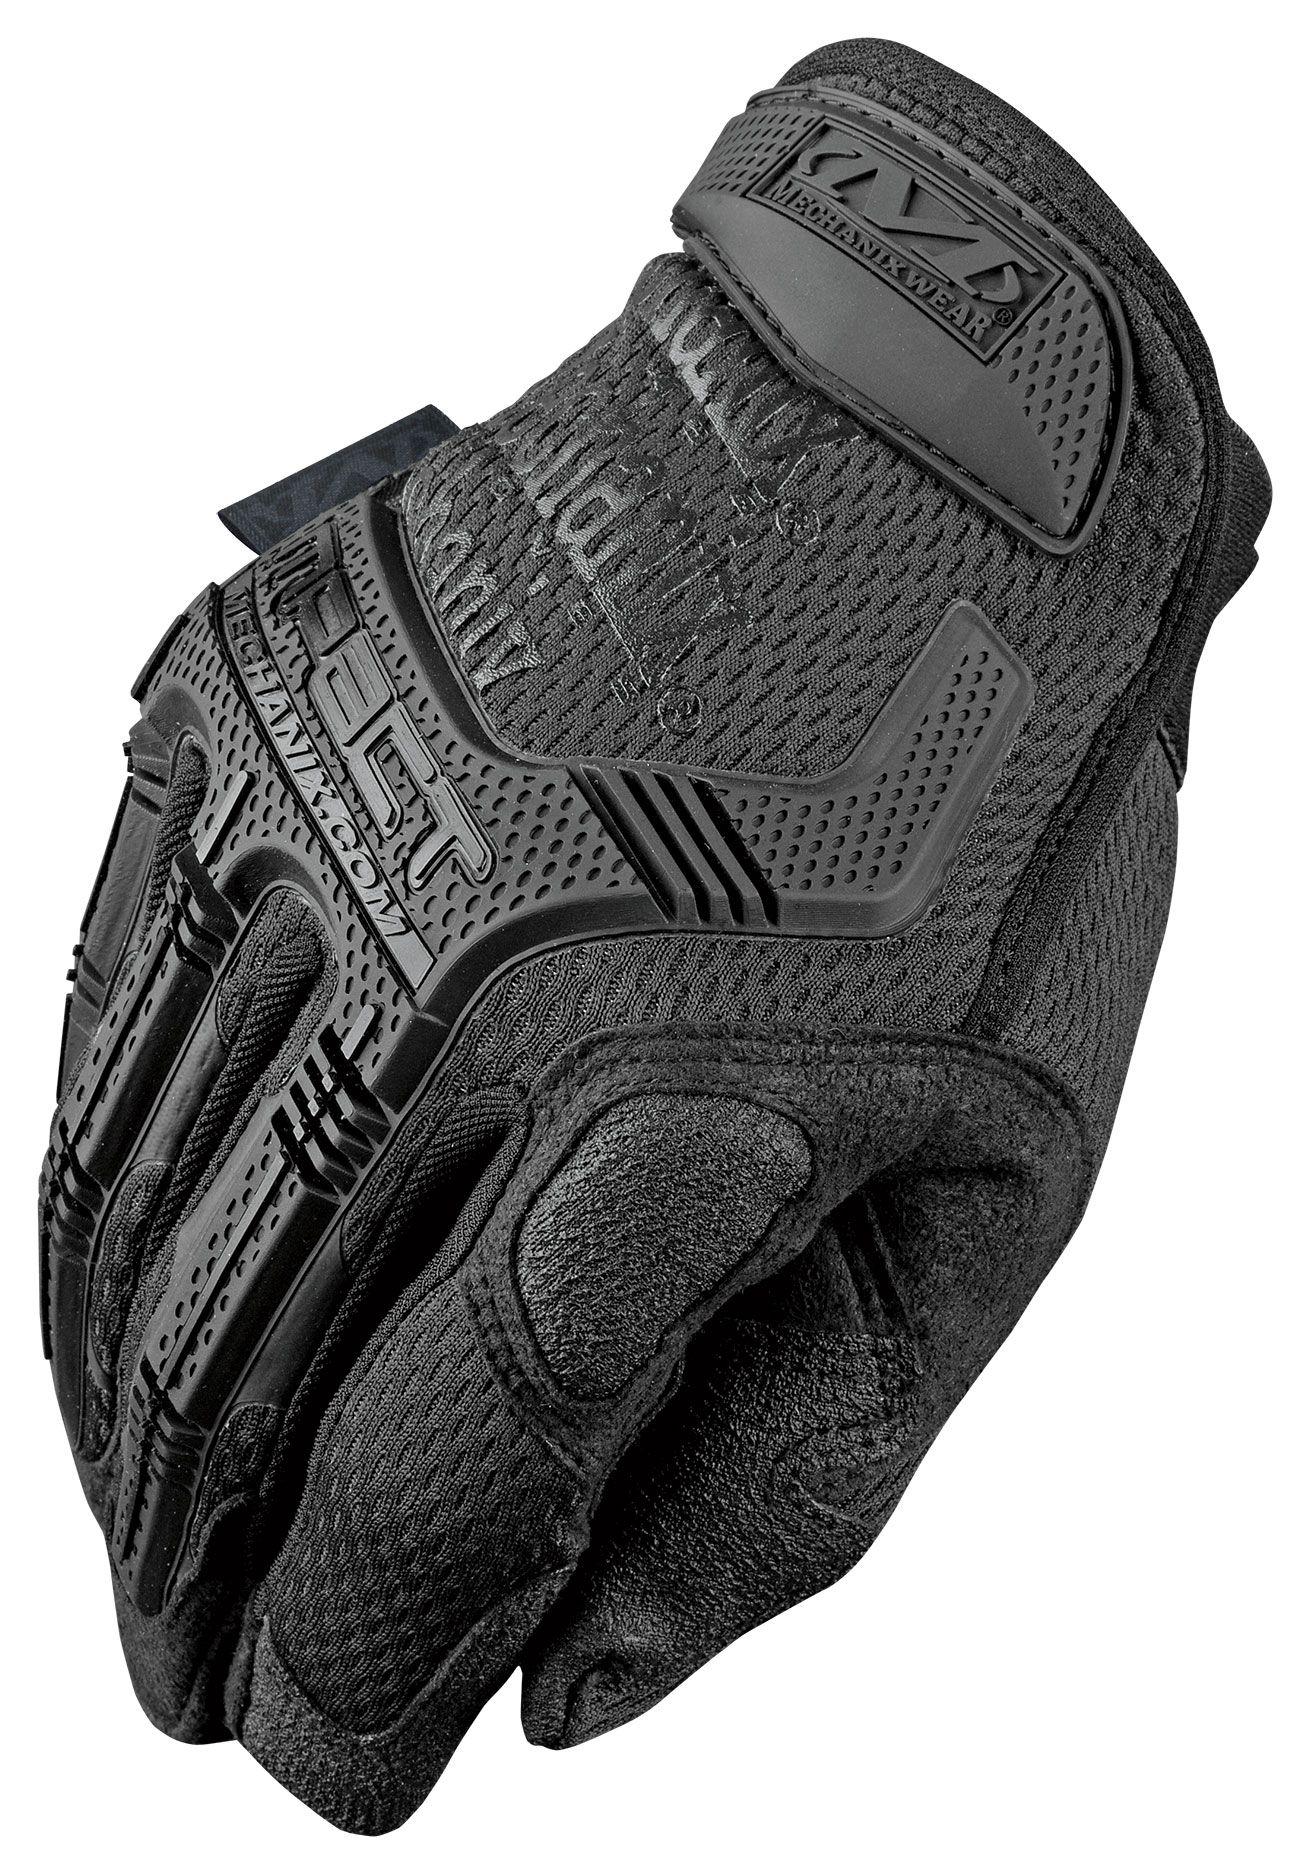 Mechanix Wear MPact Tactical Gloves Tactical gloves